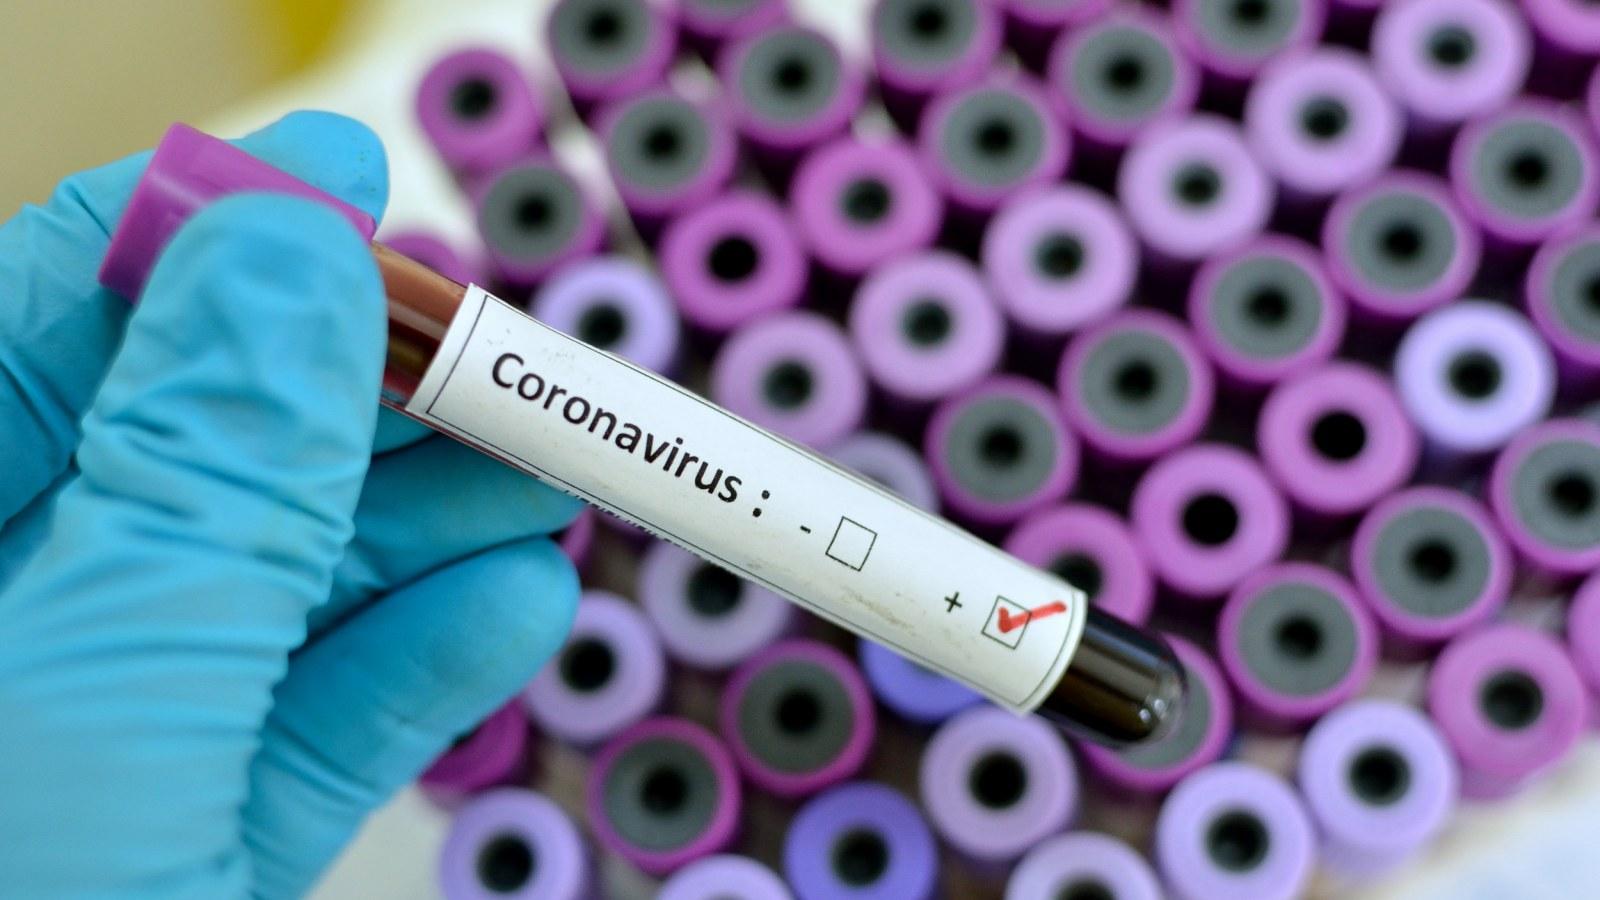 Image result for corona virus hd wallpaper